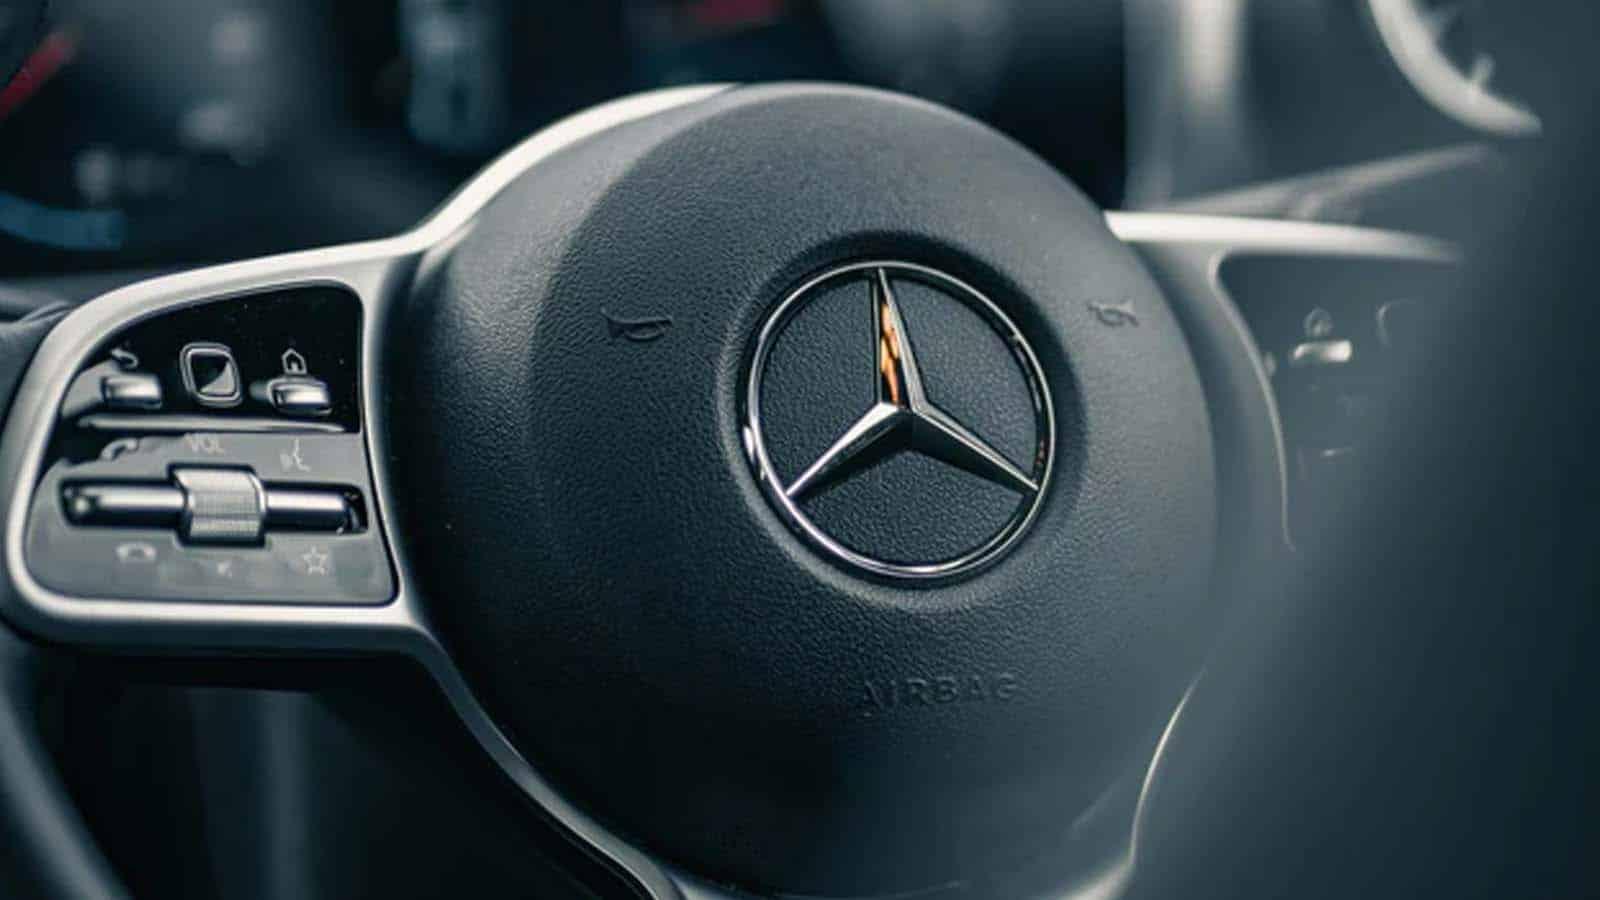 mercedes-benz steering wheel electric vehicle